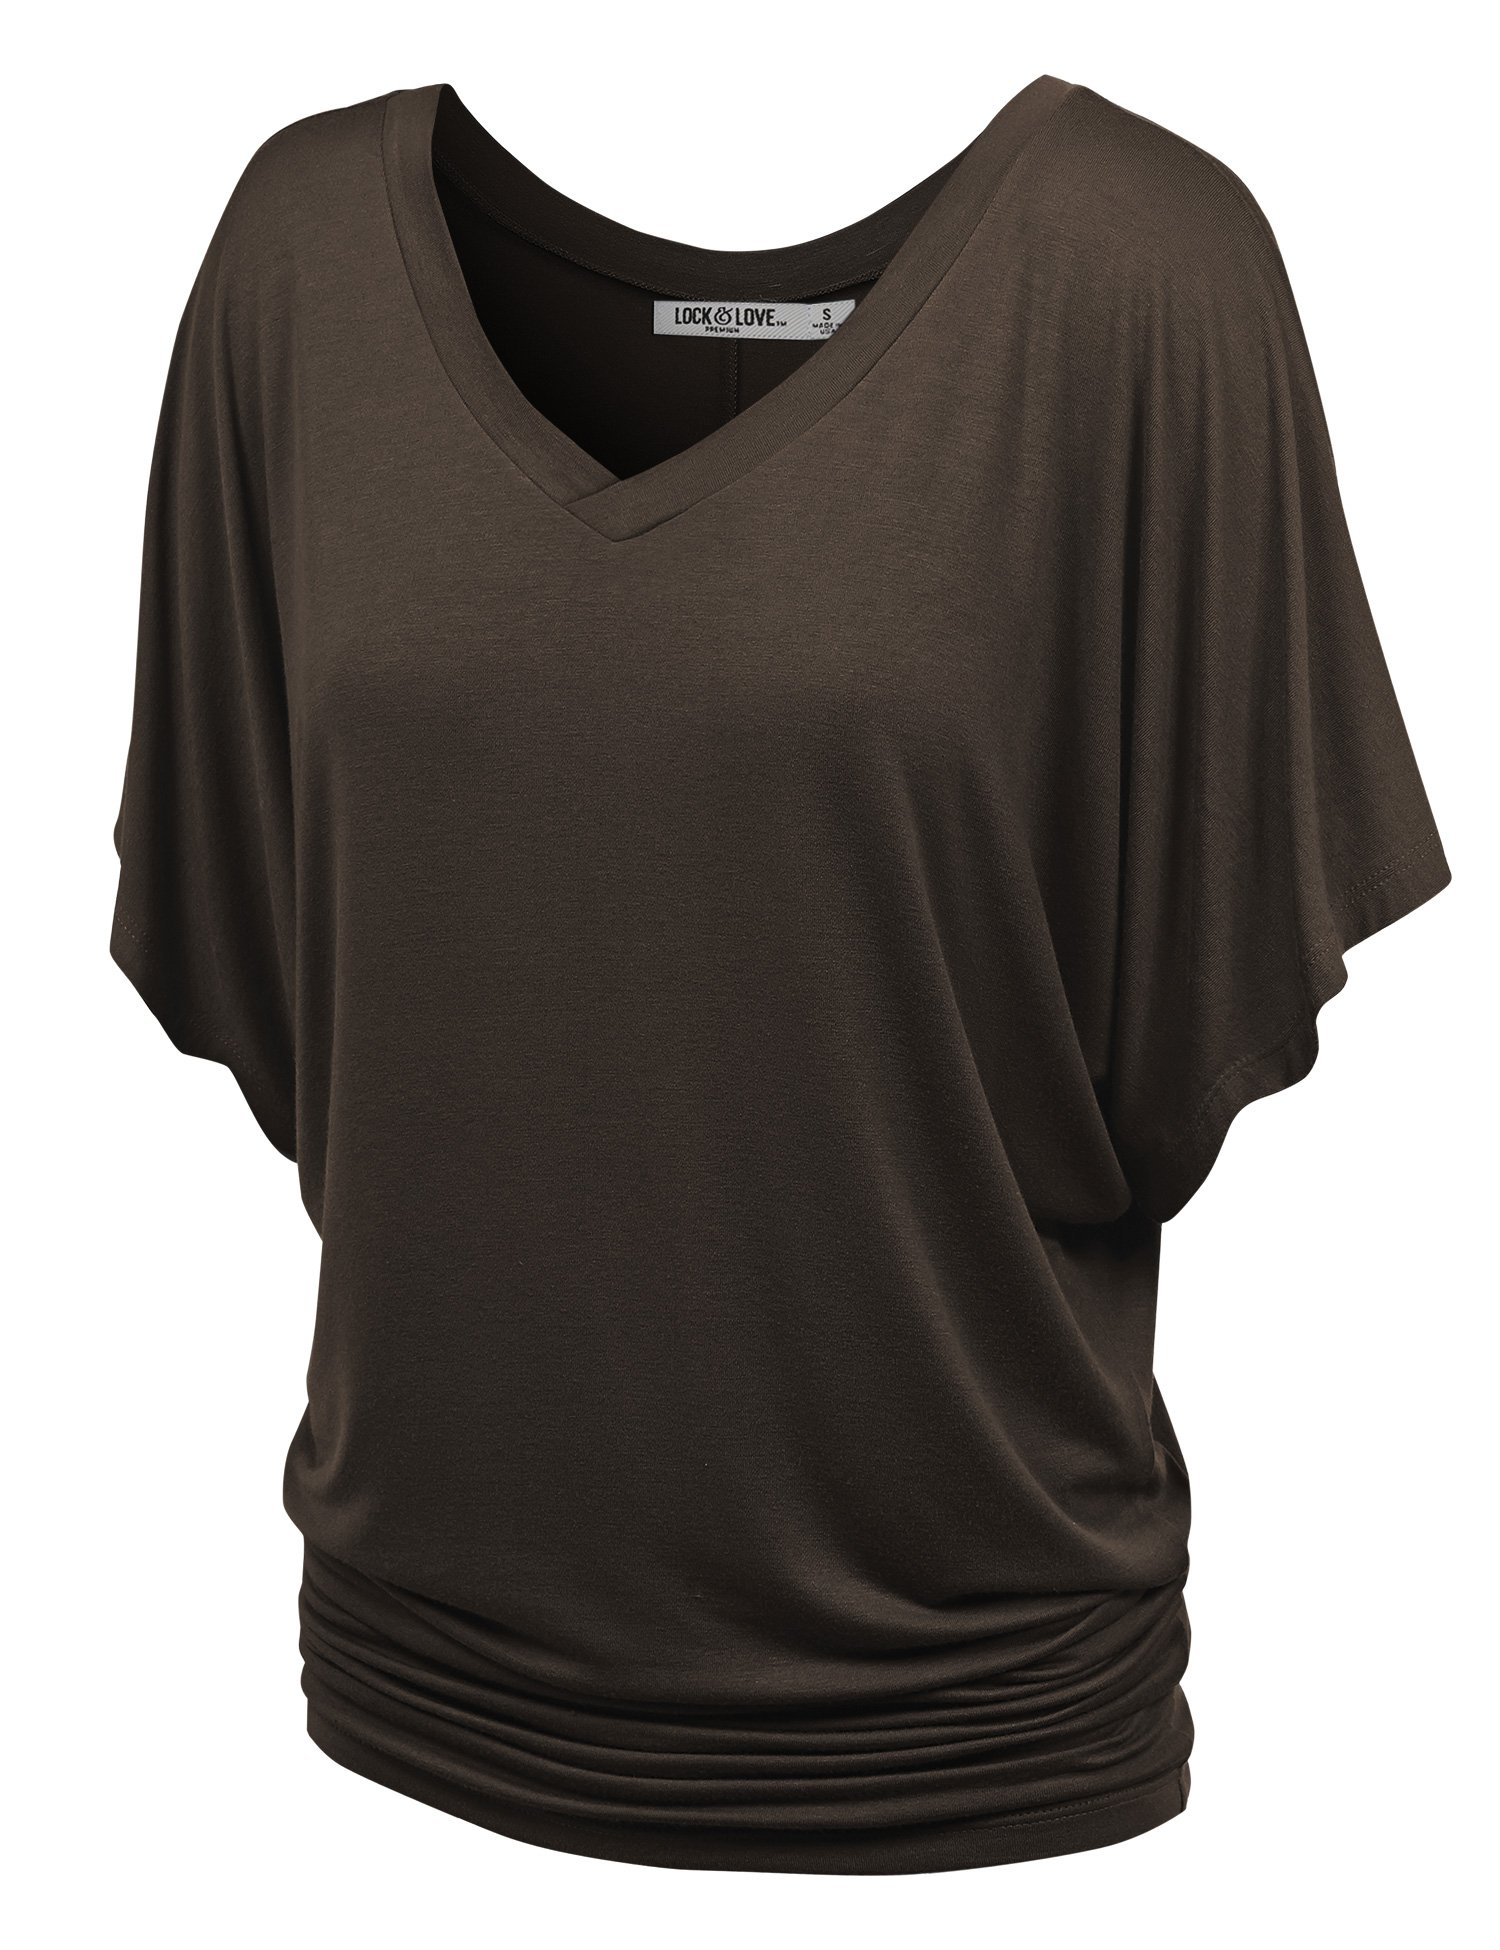 WT1038 Womens V Neck Short Sleeve Dolman Top XL BROWN